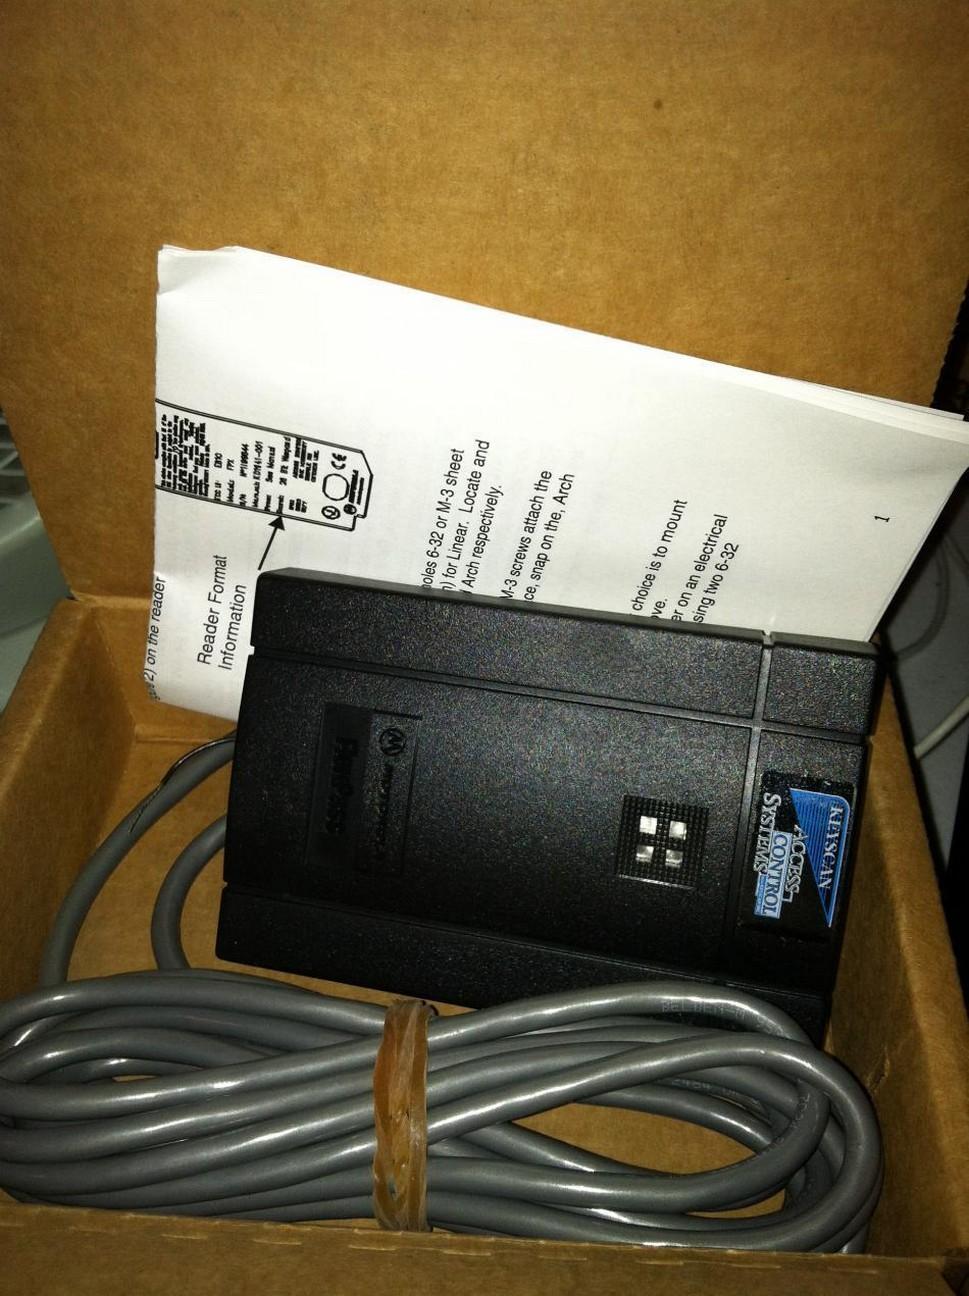 Keyscan, Inc. on contactor wiring, ac drive wiring, motherboard wiring, arduino uno wiring, switch wiring, terminal block wiring, control wiring, plc wiring, thermostat wiring, capacitor wiring, transducer wiring,